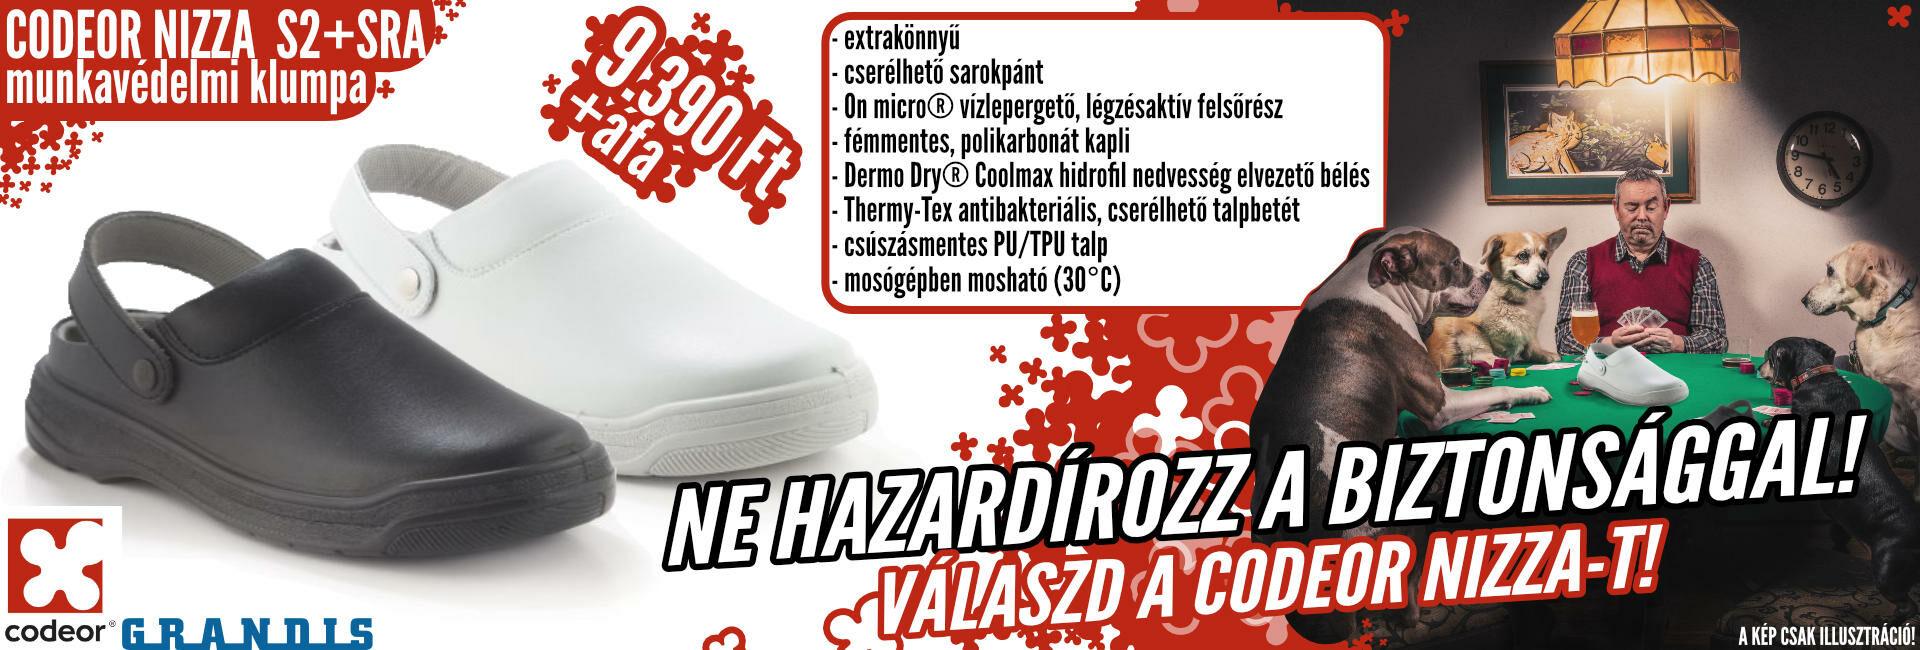 codeor-nizza-banner-grandis-hu